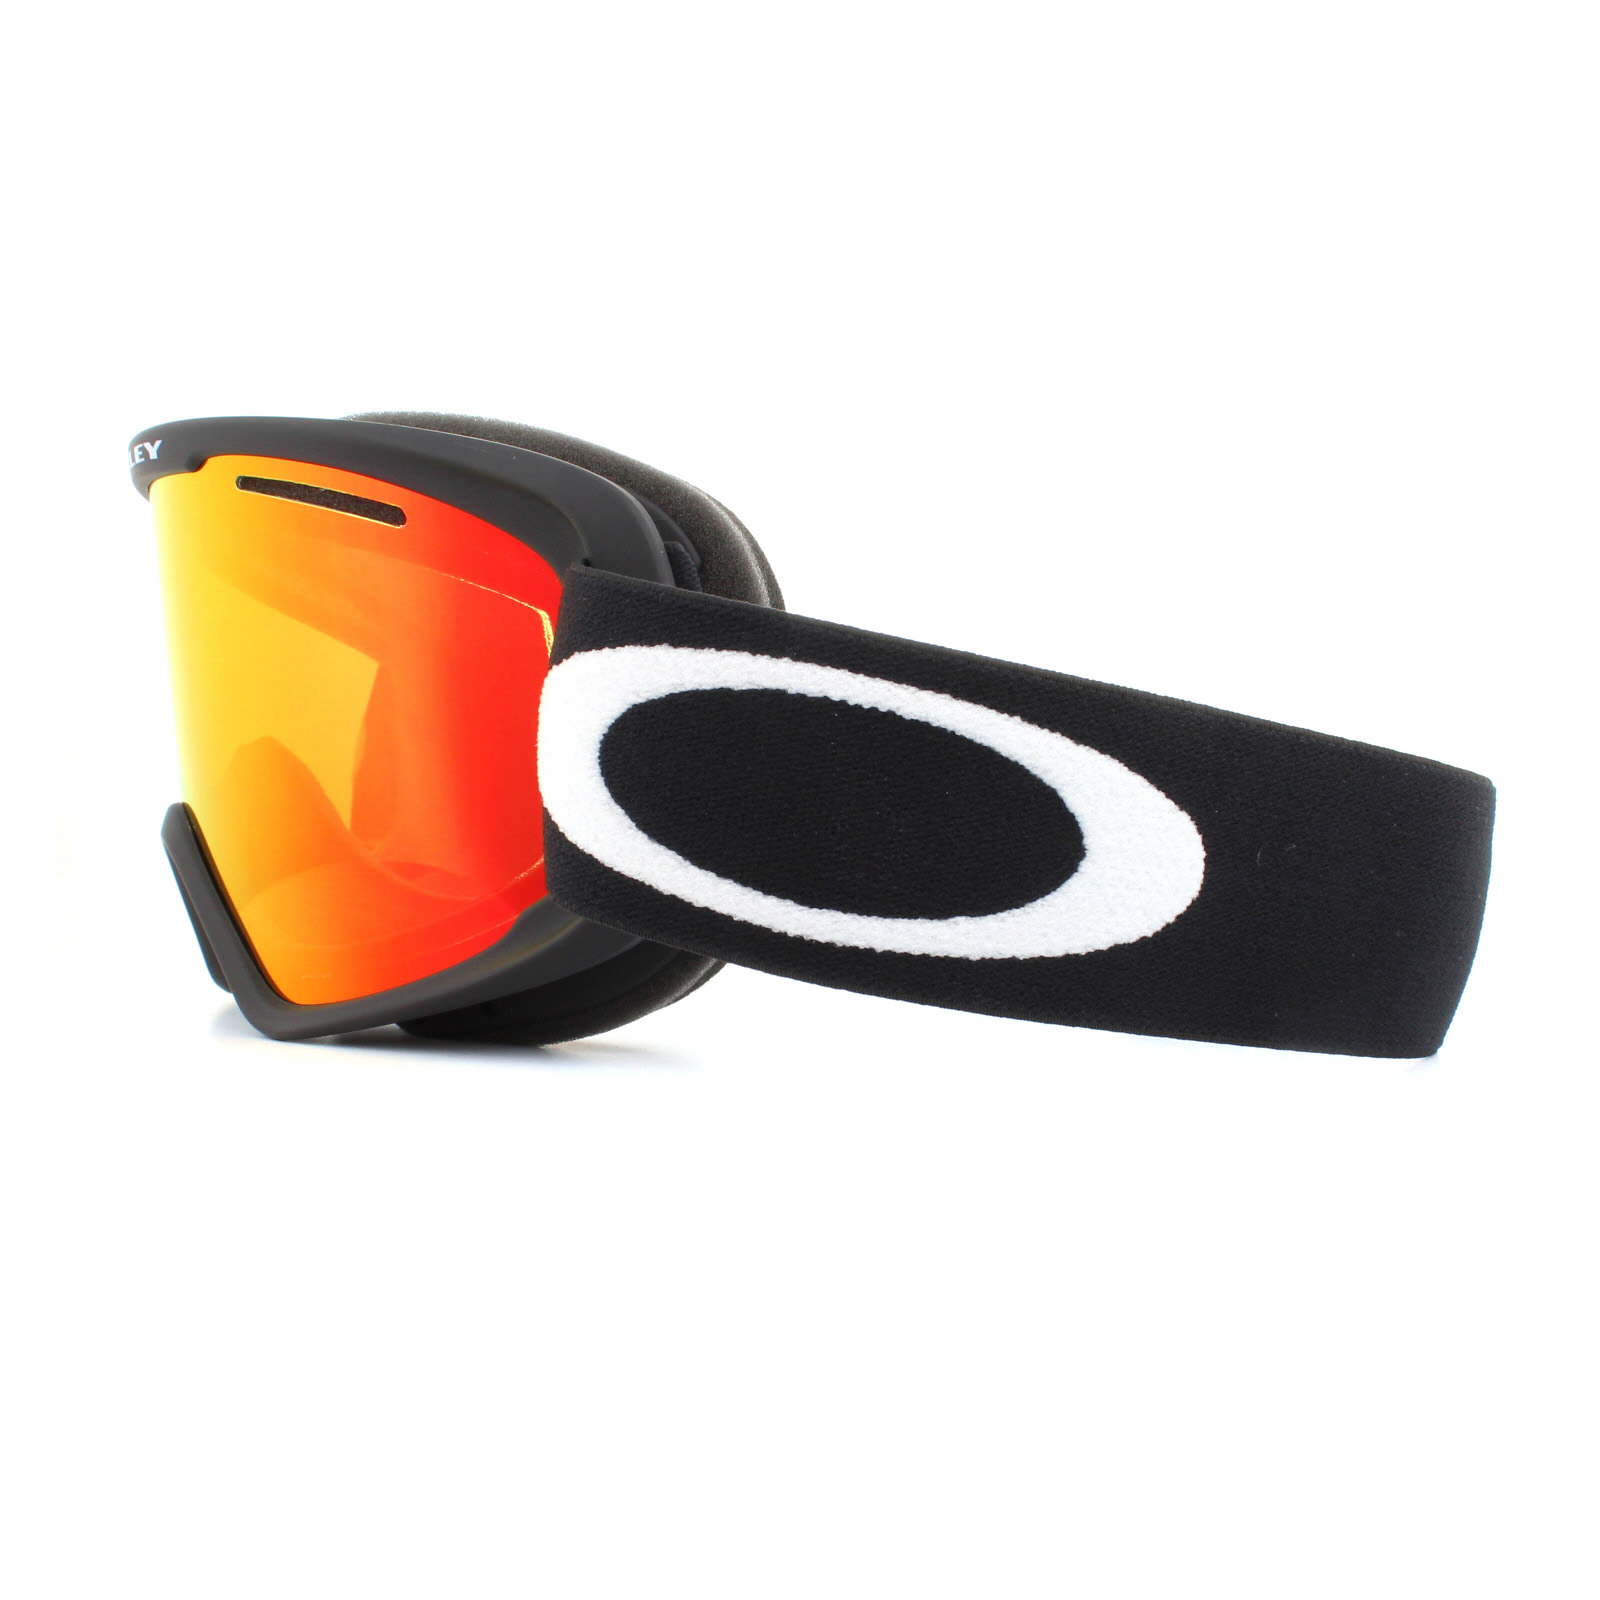 bf19a2901d Sentinel Oakley Ski Goggles O2 XM OO7066-52 Matte Black Fire Iridium